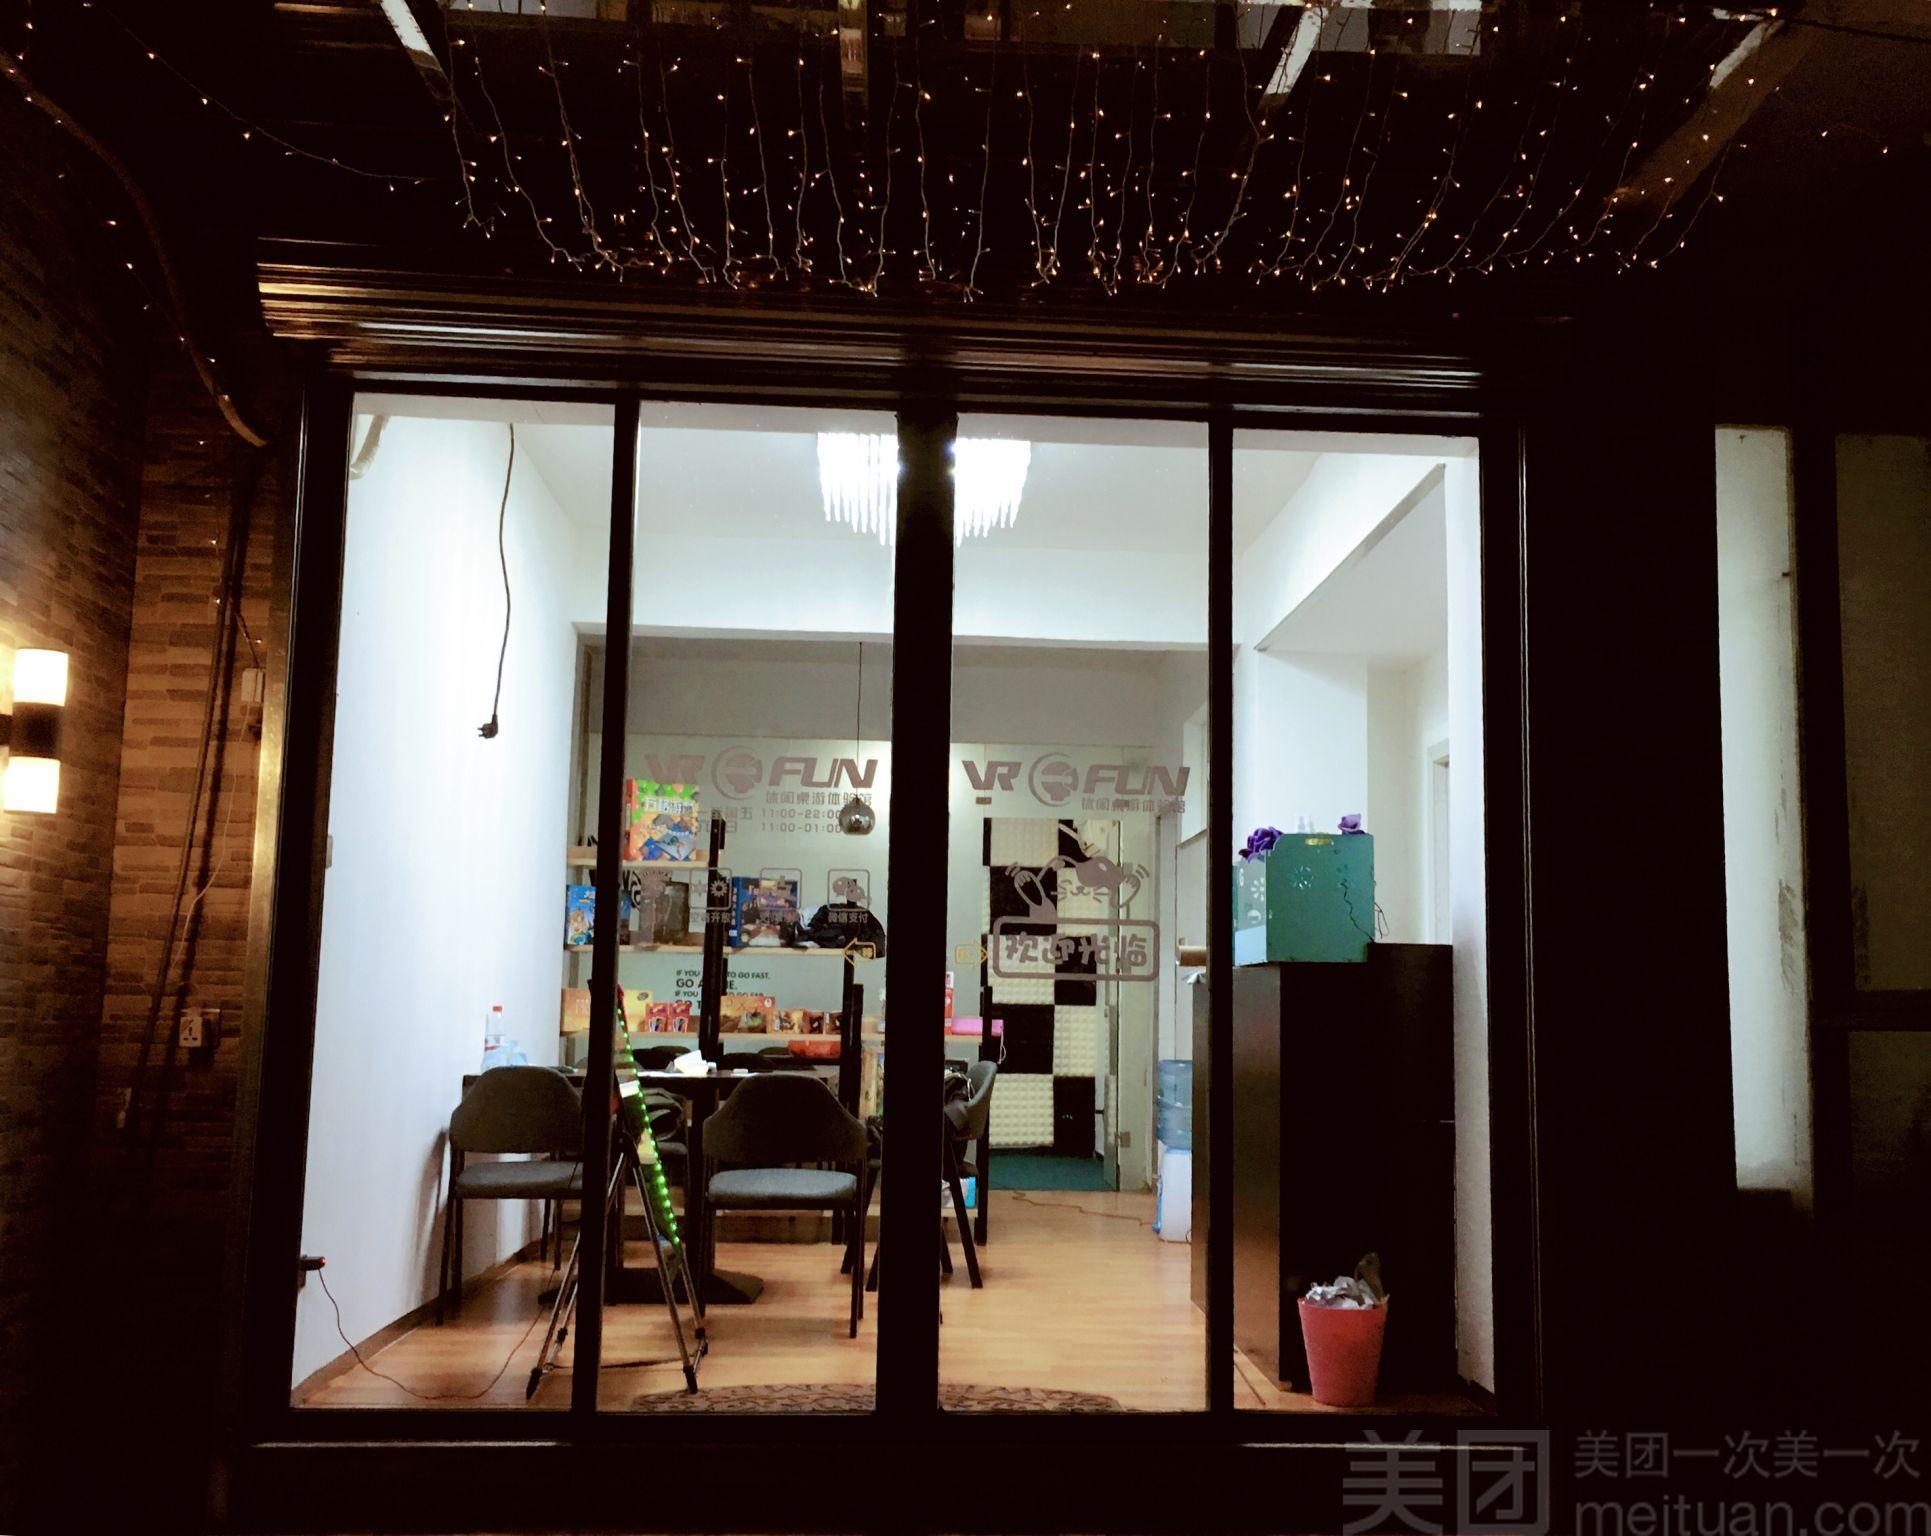 VR Fun休闲桌游体验馆(北京路店)-美团